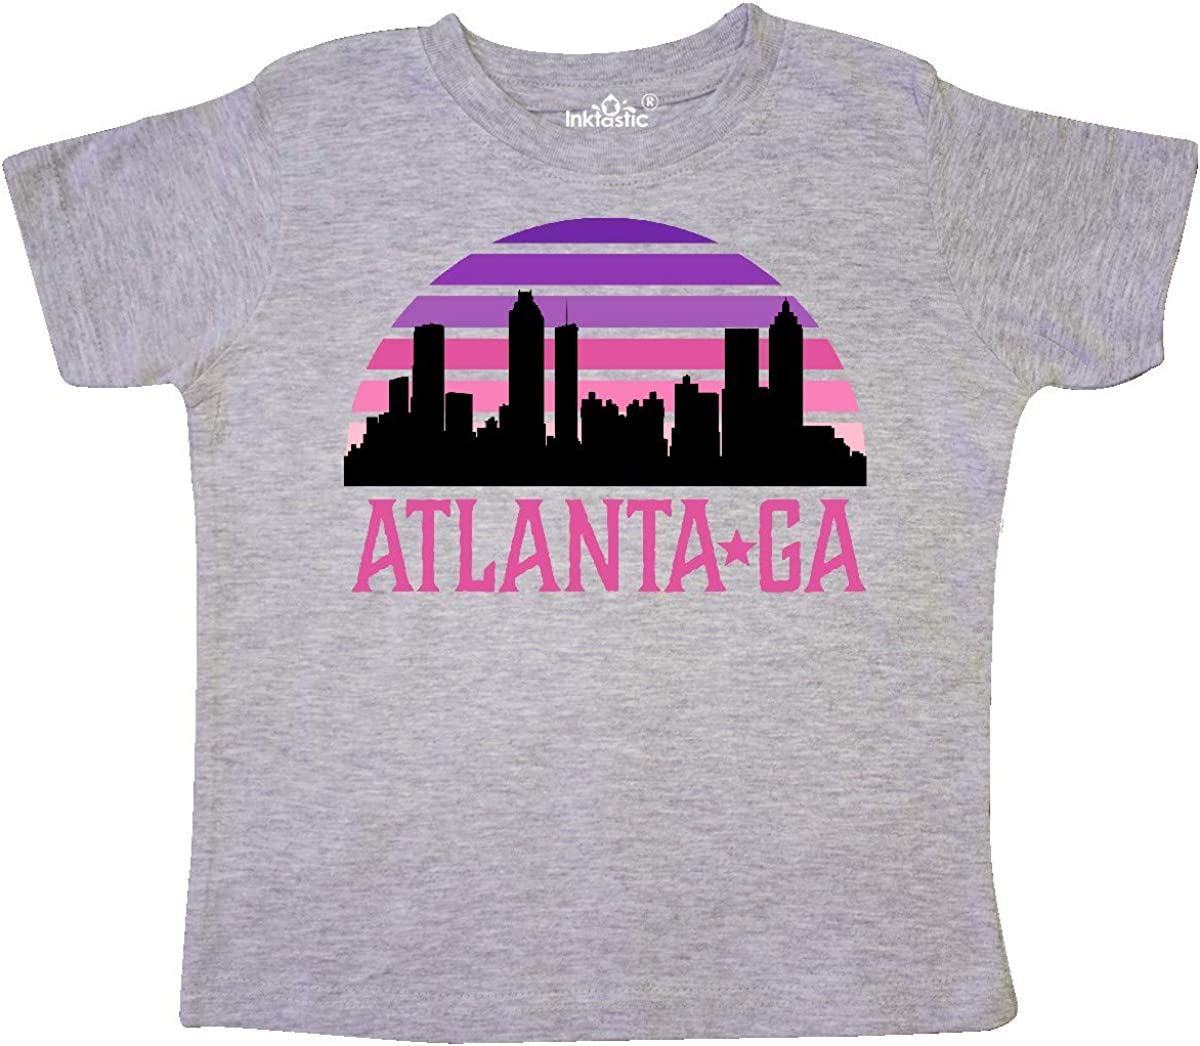 inktastic Atlanta Georgia Retro Sunset Skyline Toddler T-Shirt